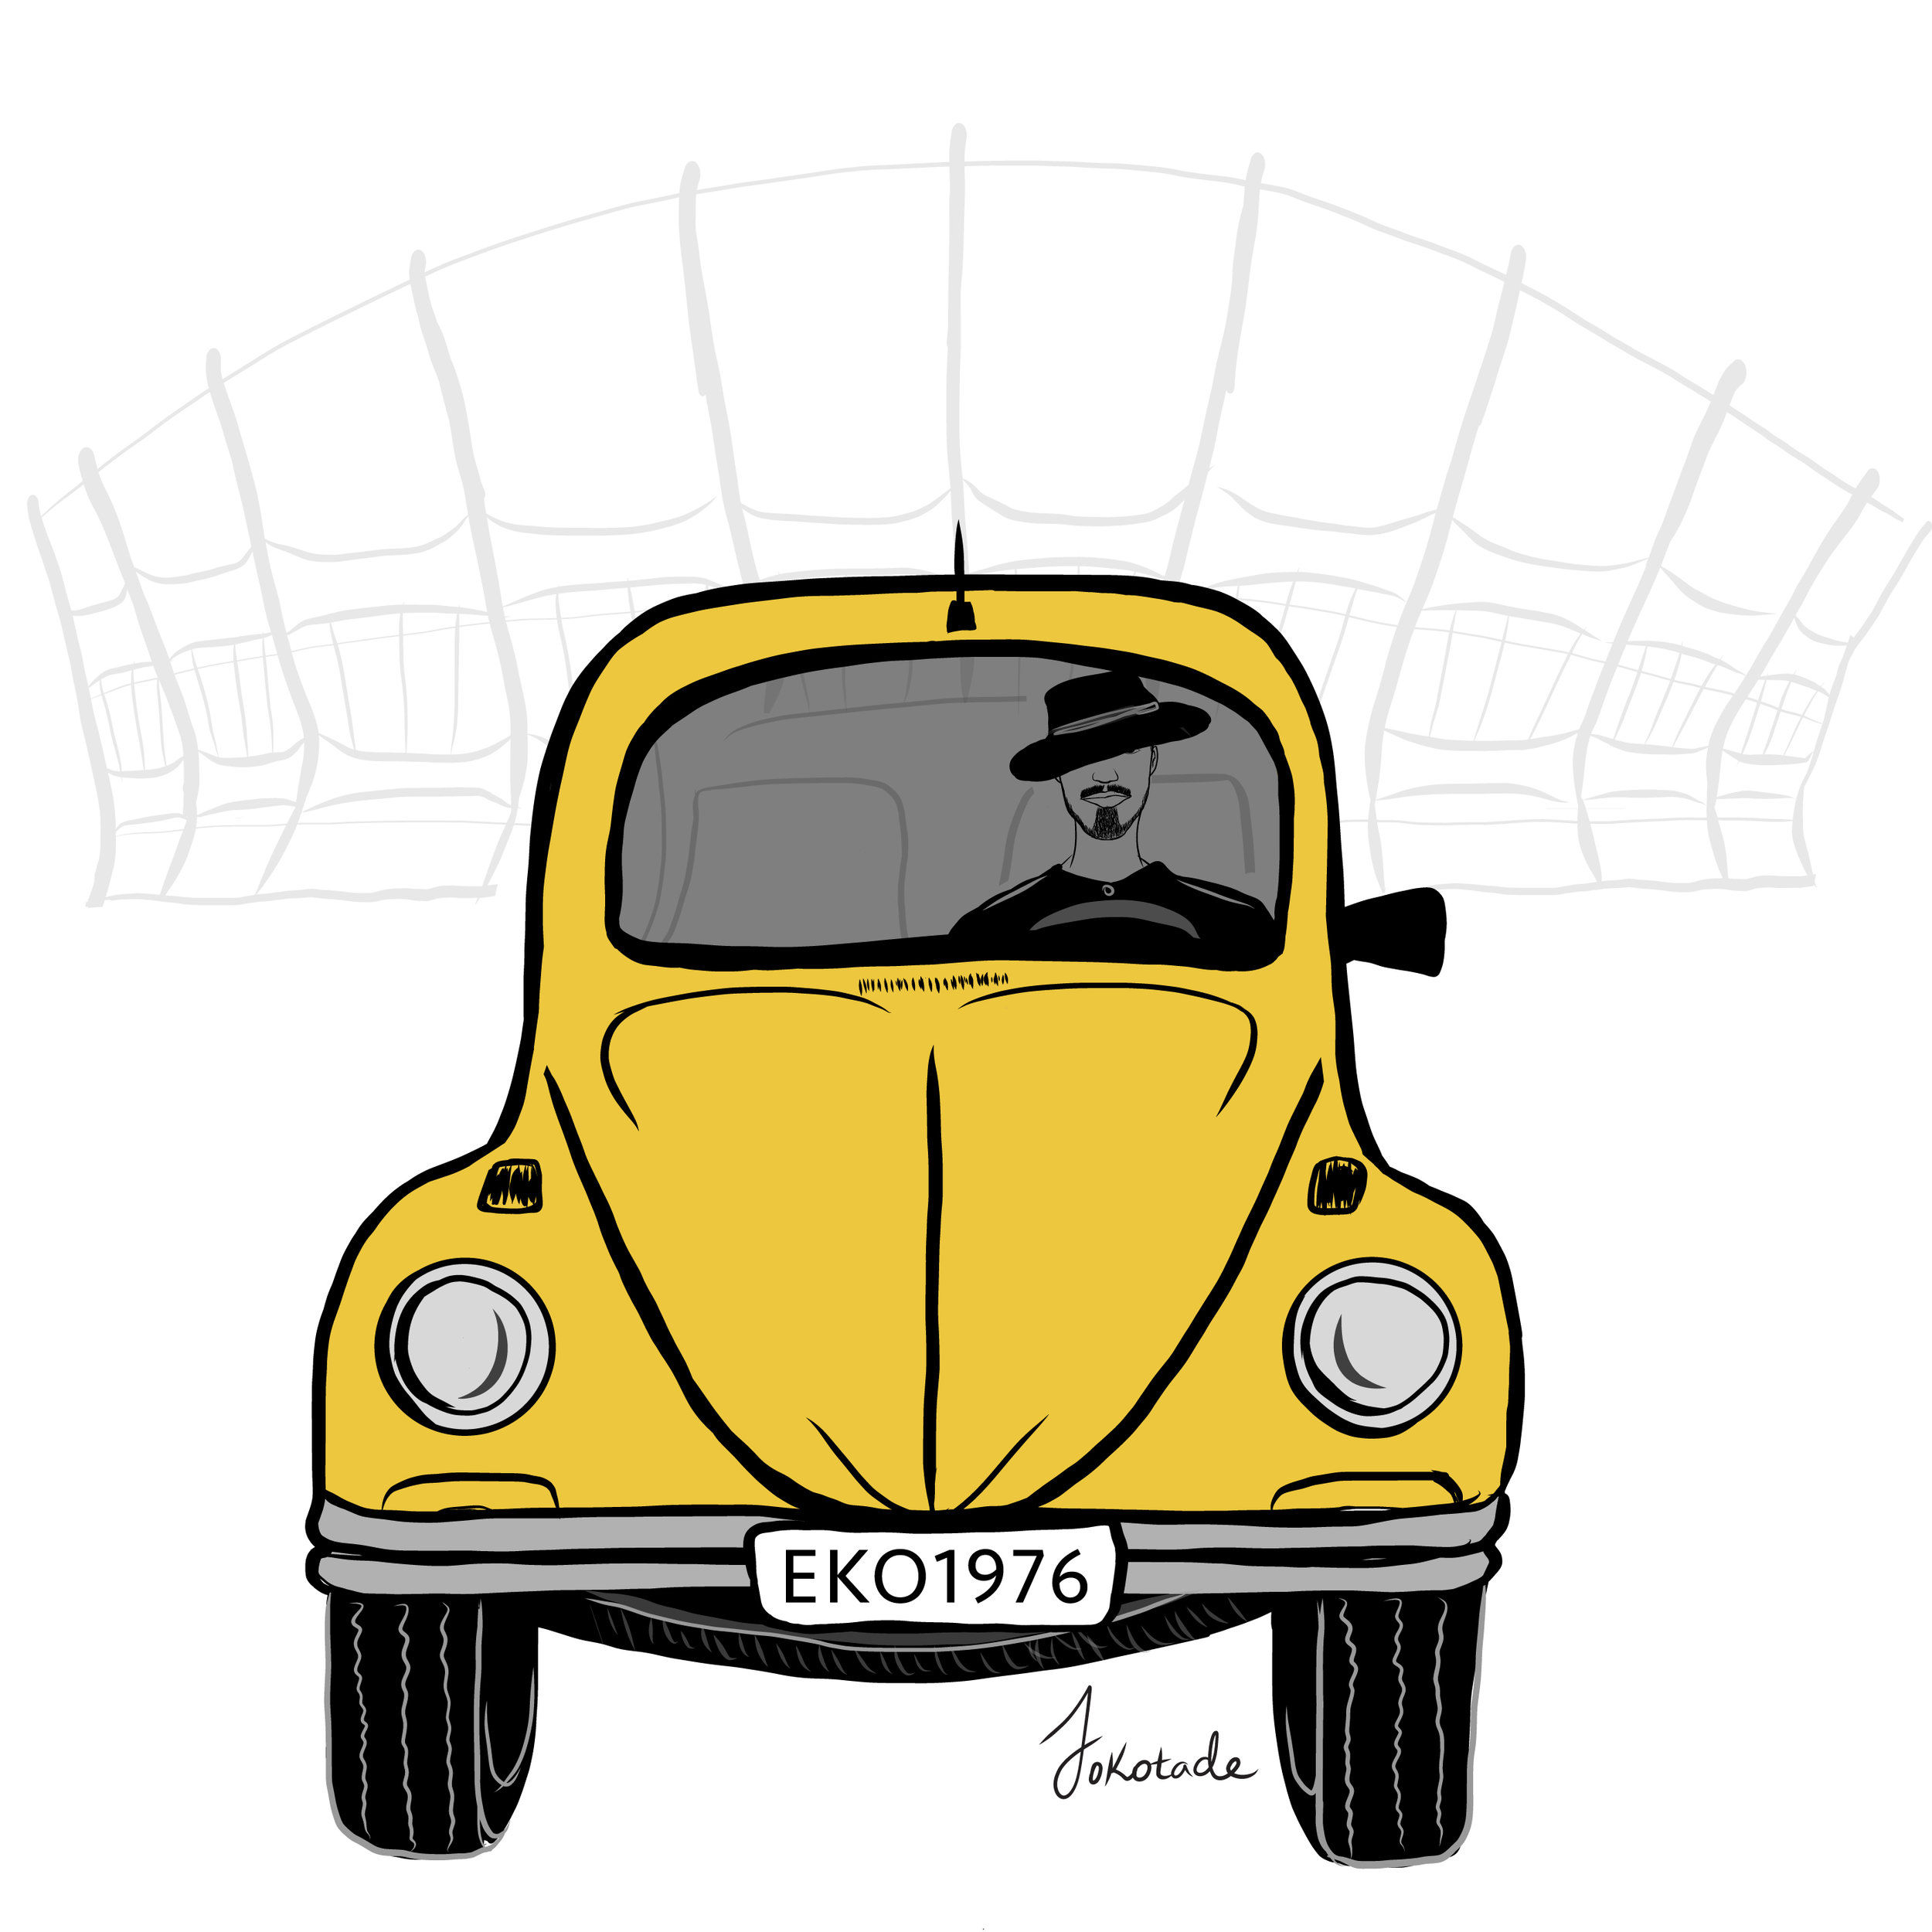 Jokotade.com-lagos-1970s-lagos-illustrated-VW-1970s-1.jpg